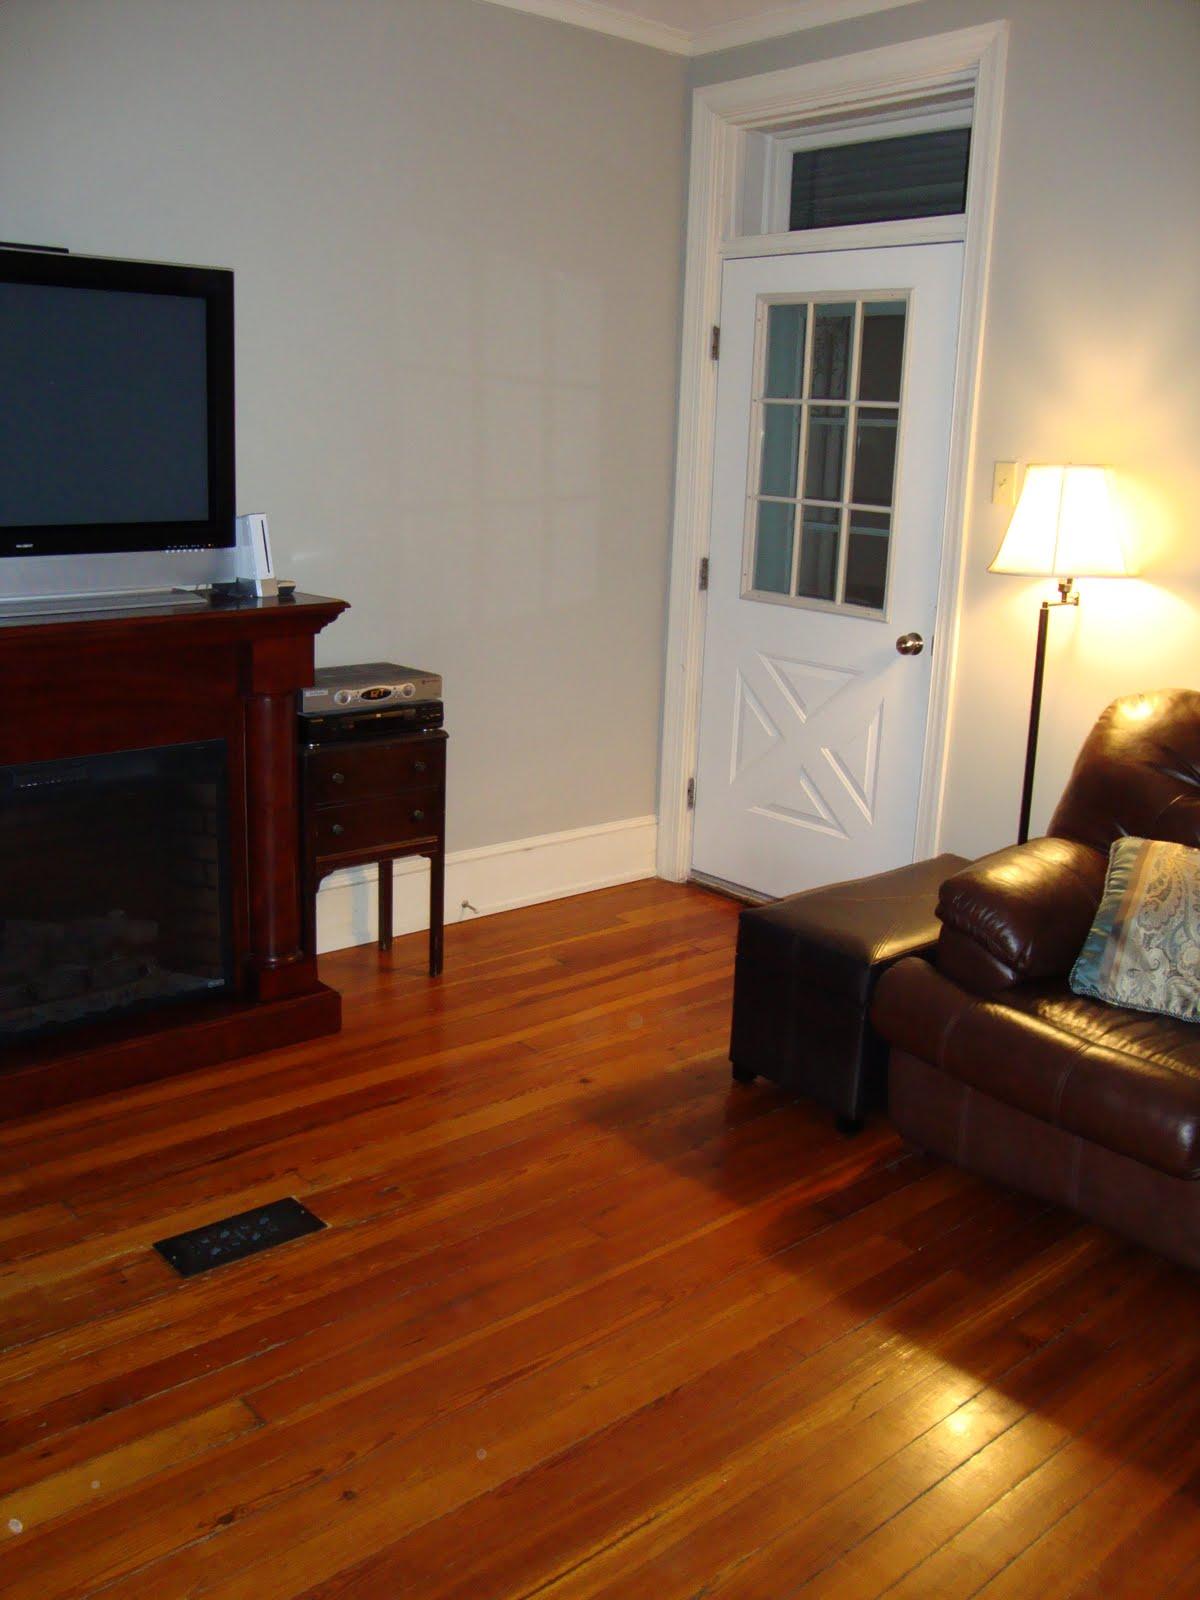 27 south 3rd street perkasie pa living room 17 x 12 ft for 16 x 12 living room